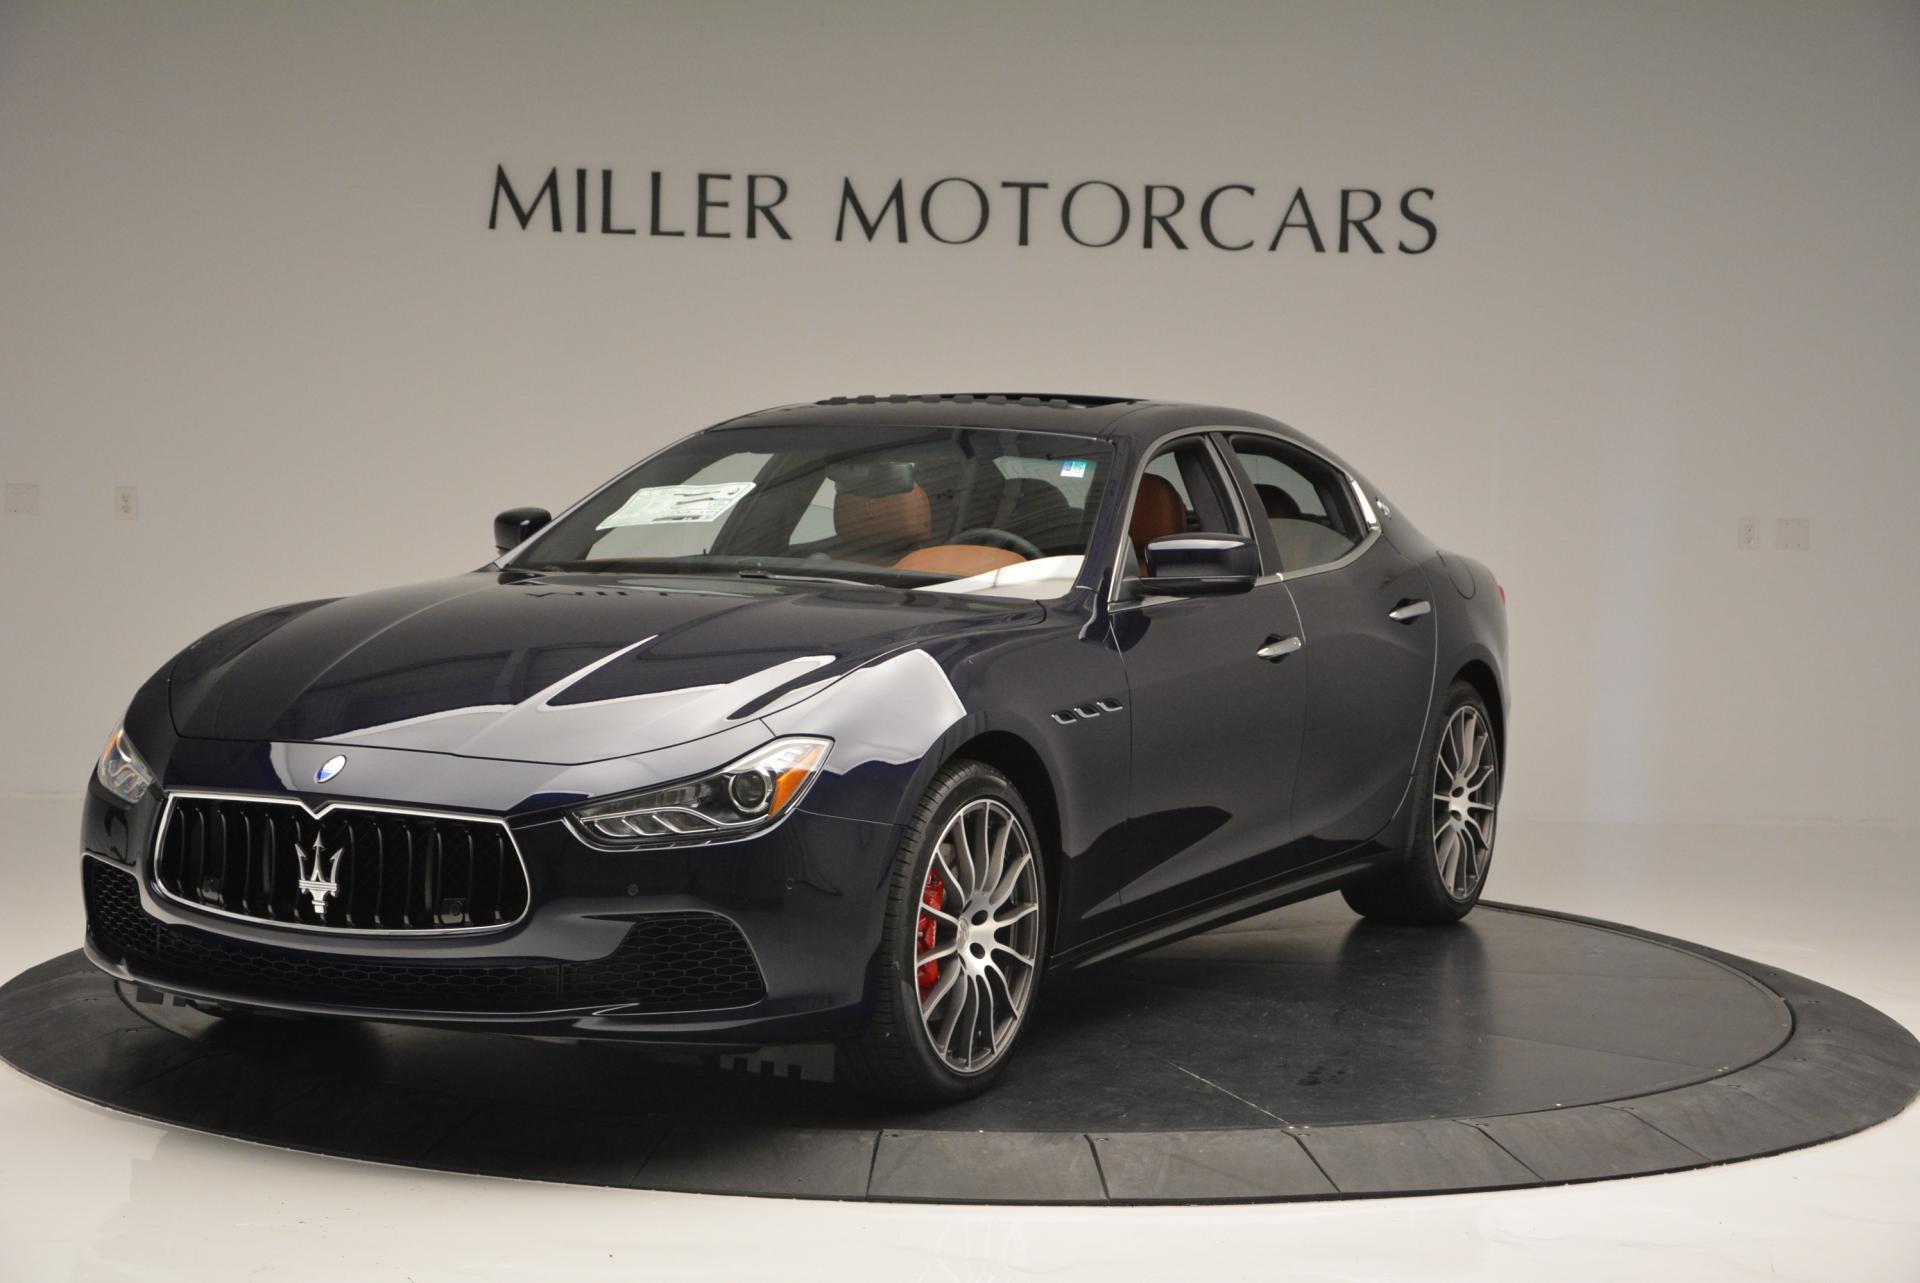 New 2016 Maserati Ghibli S Q4 For Sale In Greenwich, CT 171_main